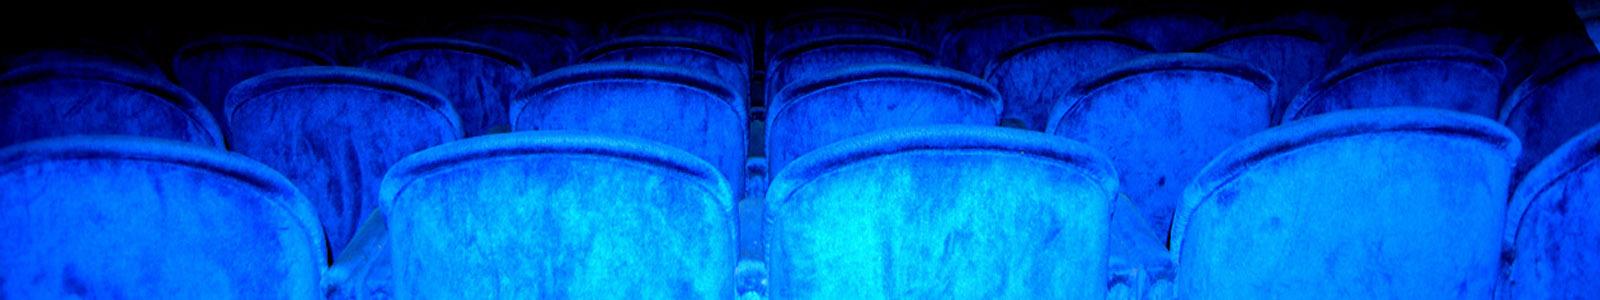 Butacas del teatro